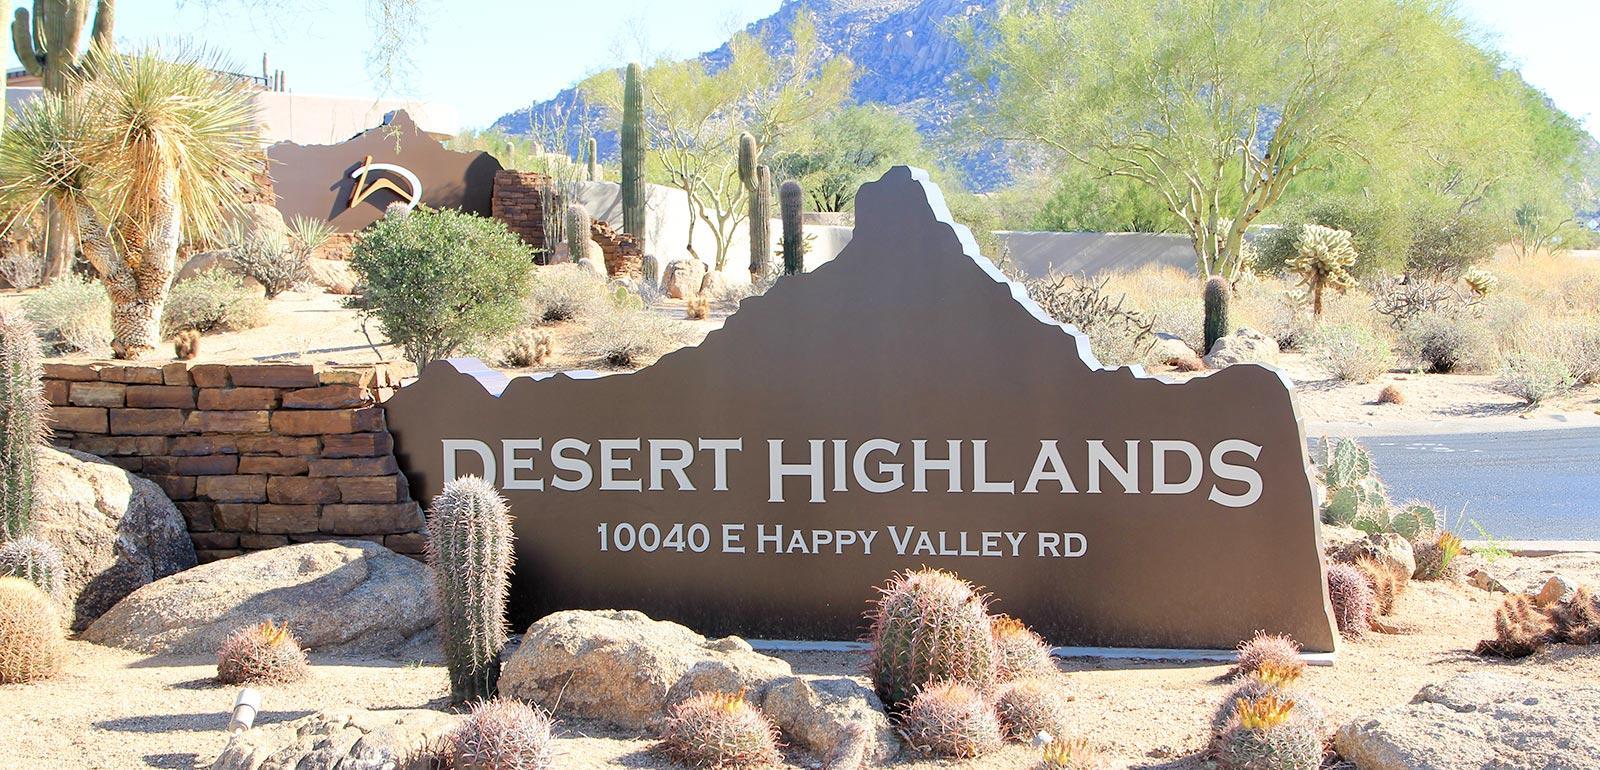 desert highlands